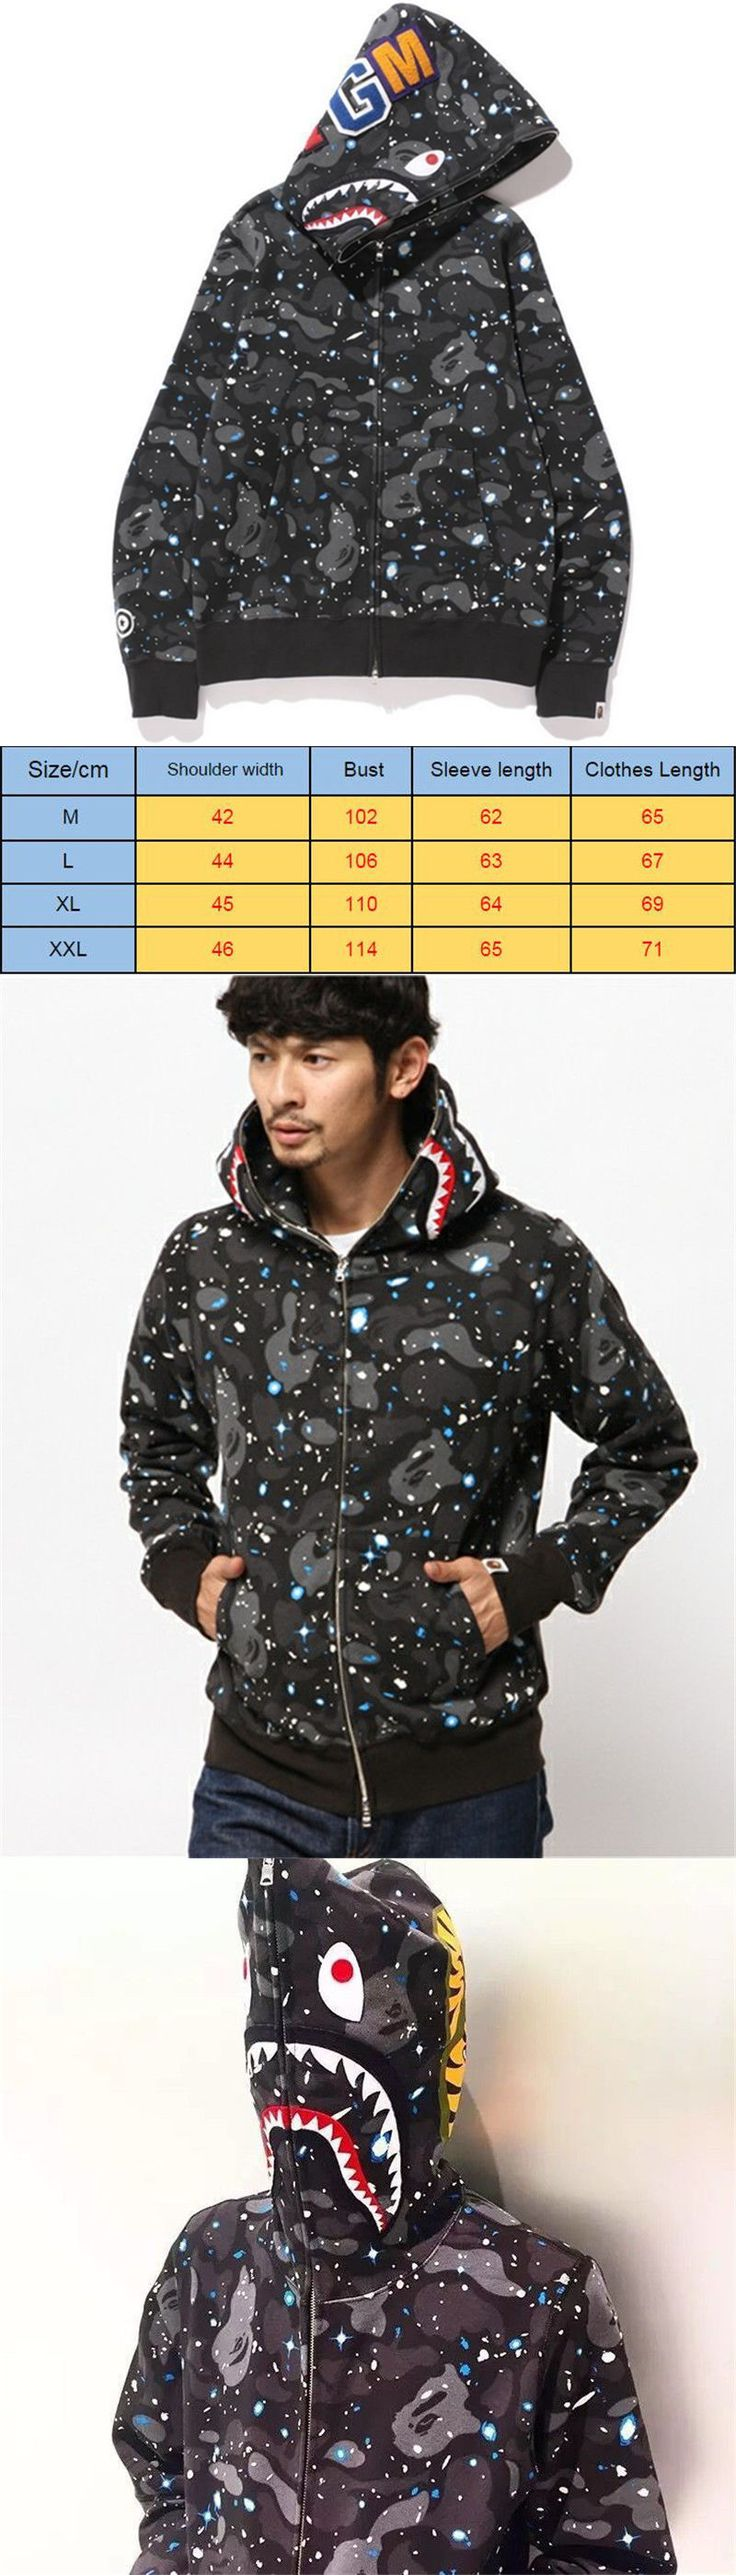 Sweats and Hoodies 155183: A Bathing Ape Bape Camouflage Coat Shark Head Full Zip Jacket Hoodie Sweatshirt~ -> BUY IT NOW ONLY: $43.39 on eBay!